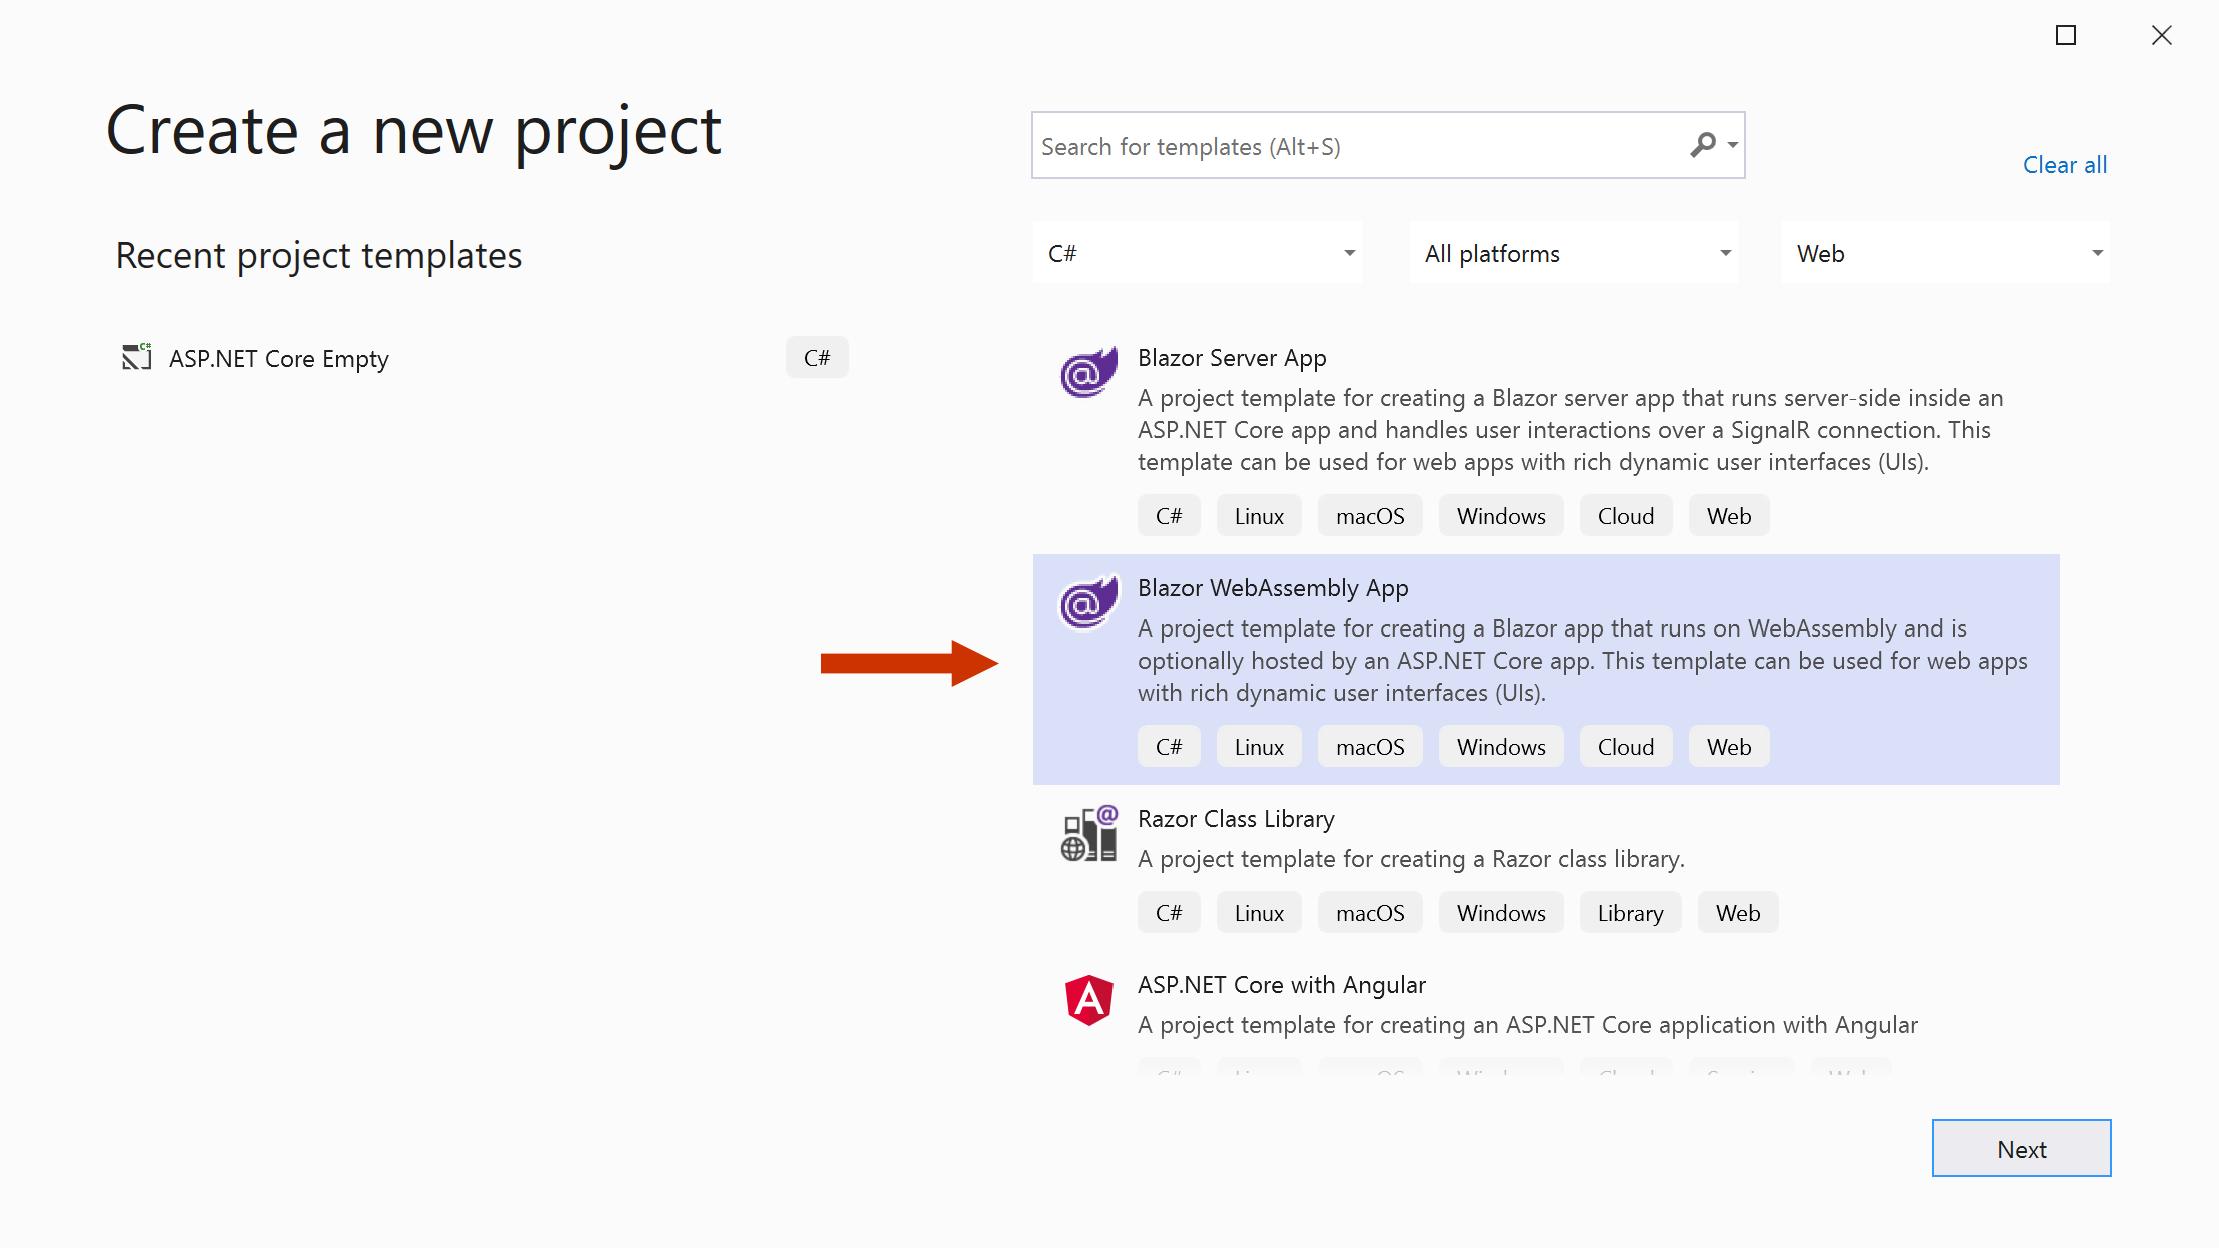 Select the Blazor WebAssembly App template